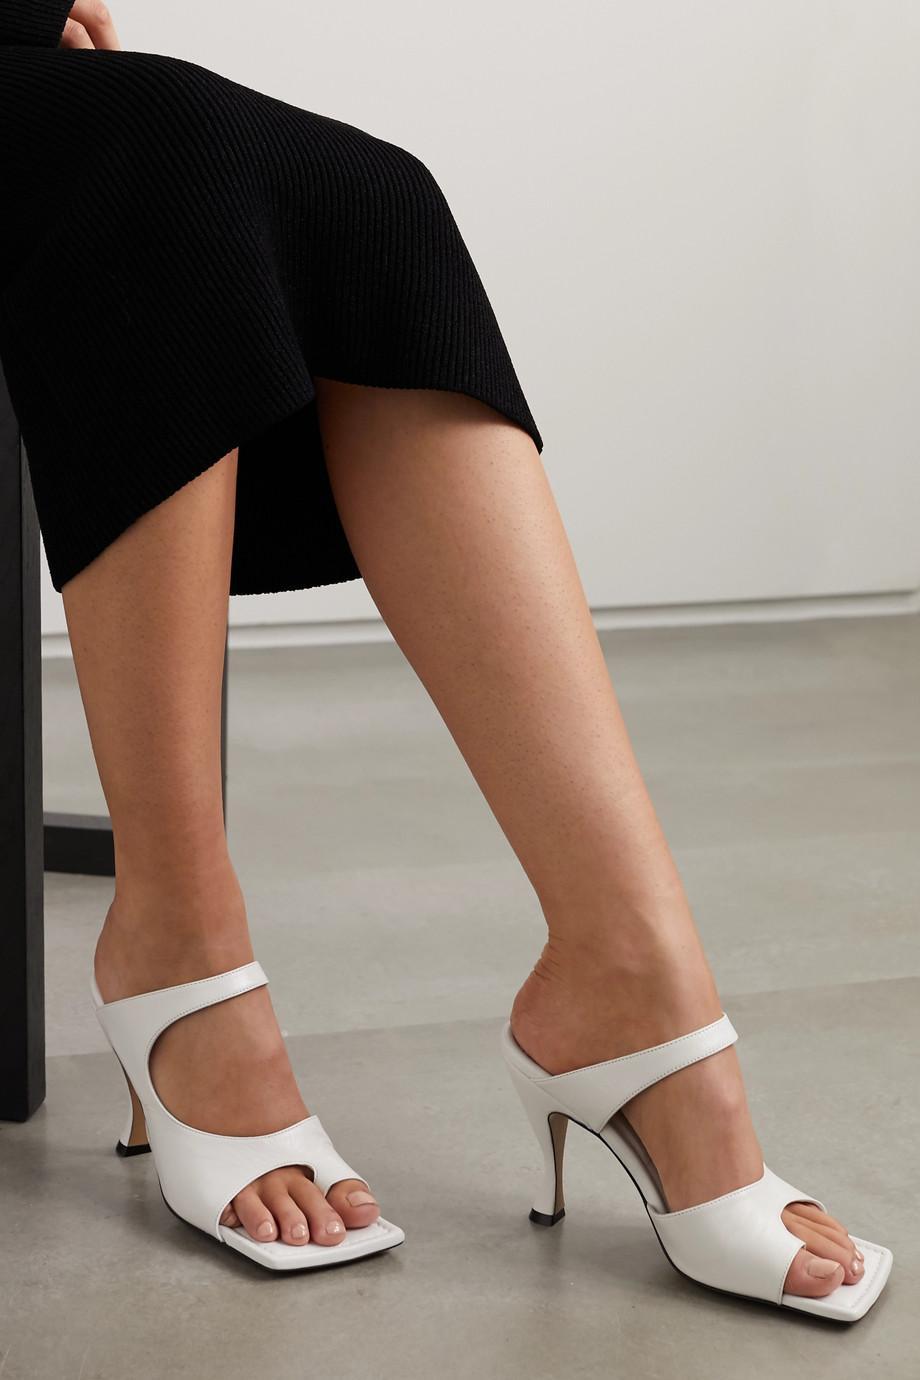 Emily Ratajkowski's Shoes Are Spring's Weirdest Sandal Trend 2